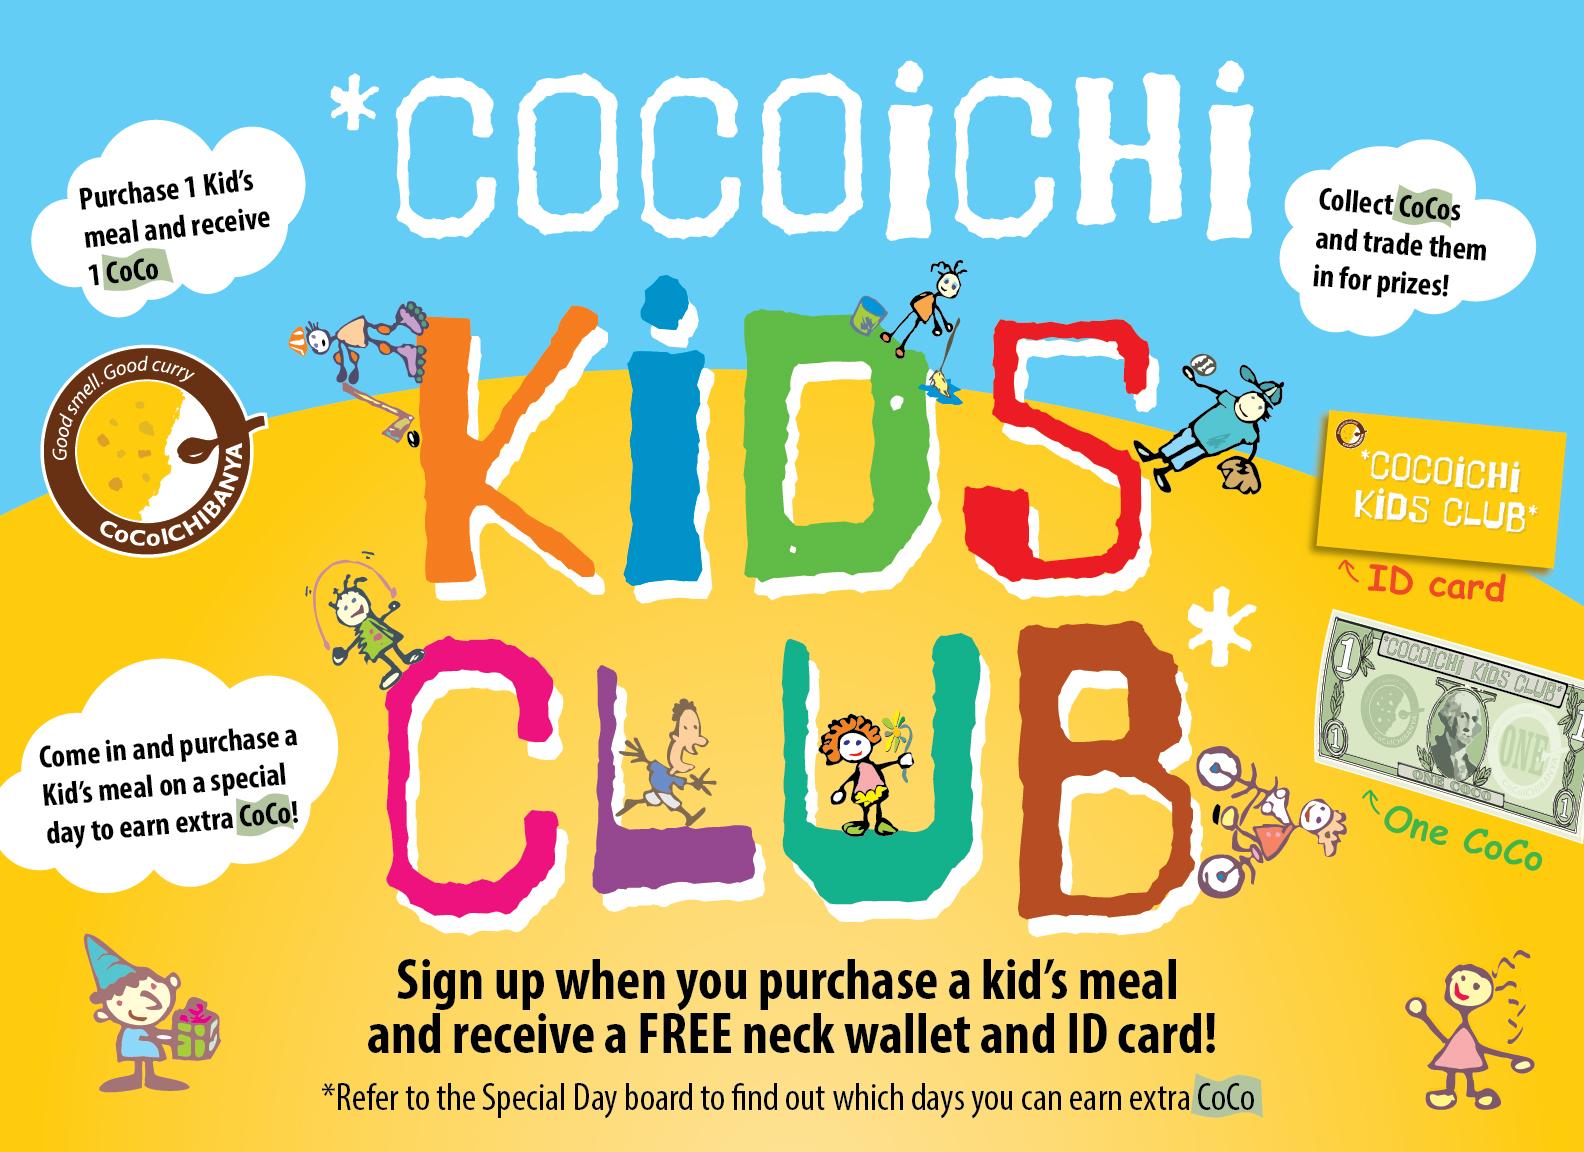 Kids Club Poster.jpg